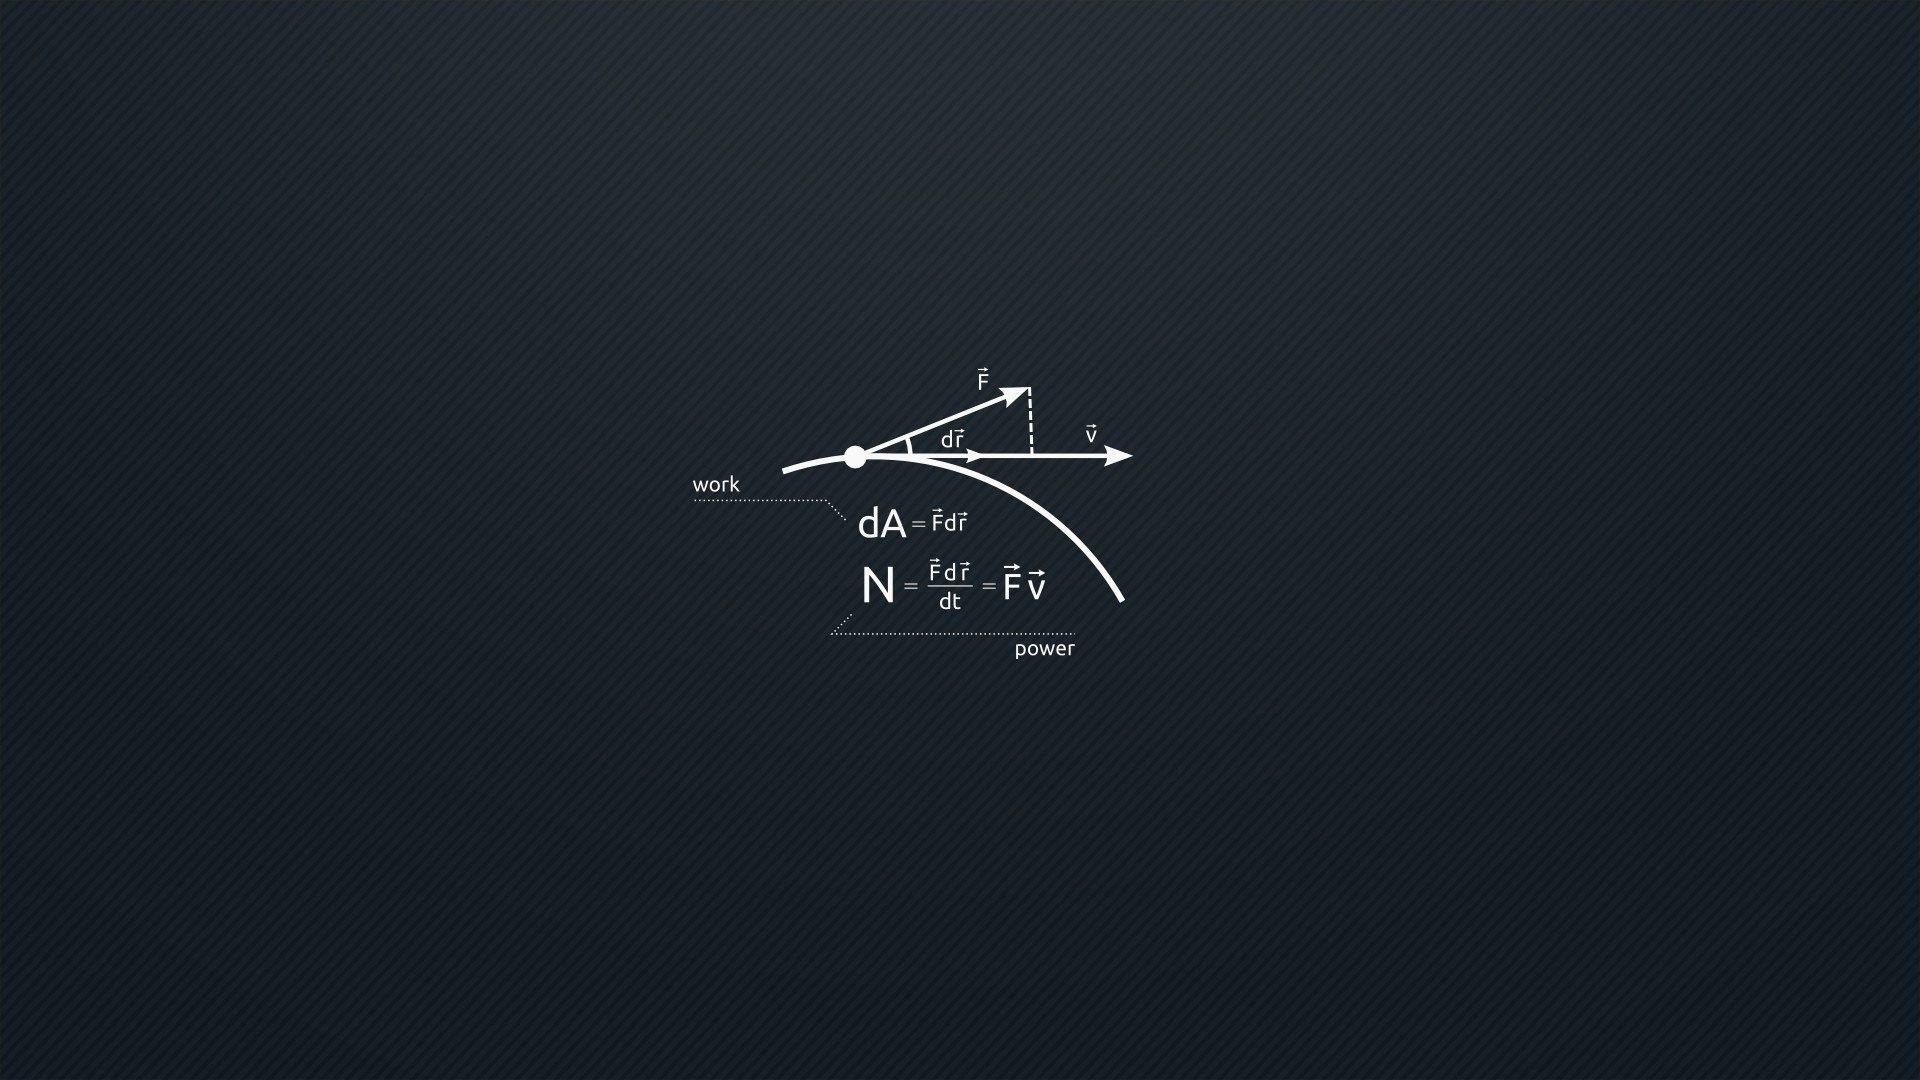 Physics Minimalist Wallpapers   Top Physics Minimalist 1920x1080